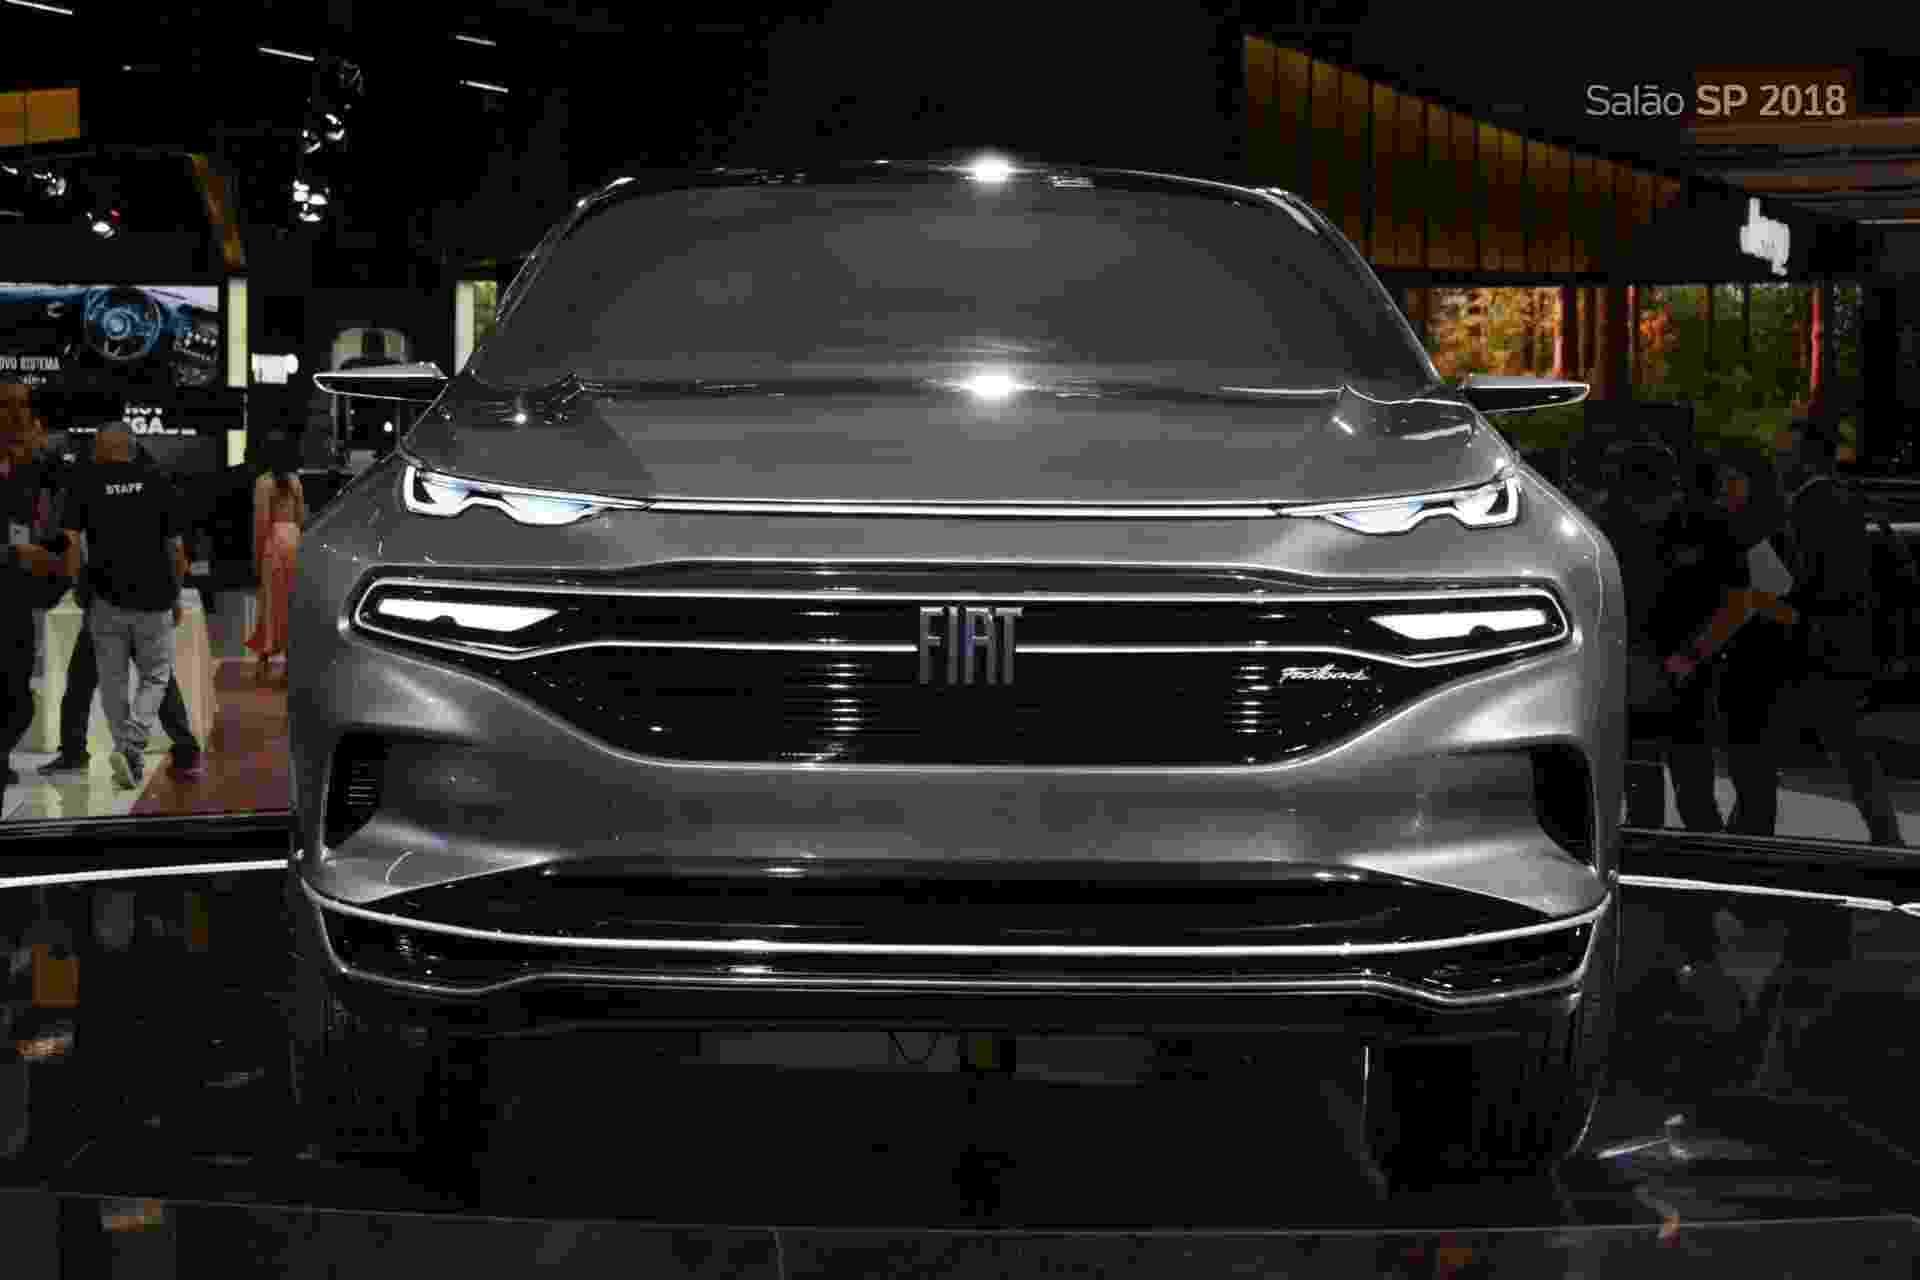 Fiat Fastback Concept - Murilo Góes/UOL